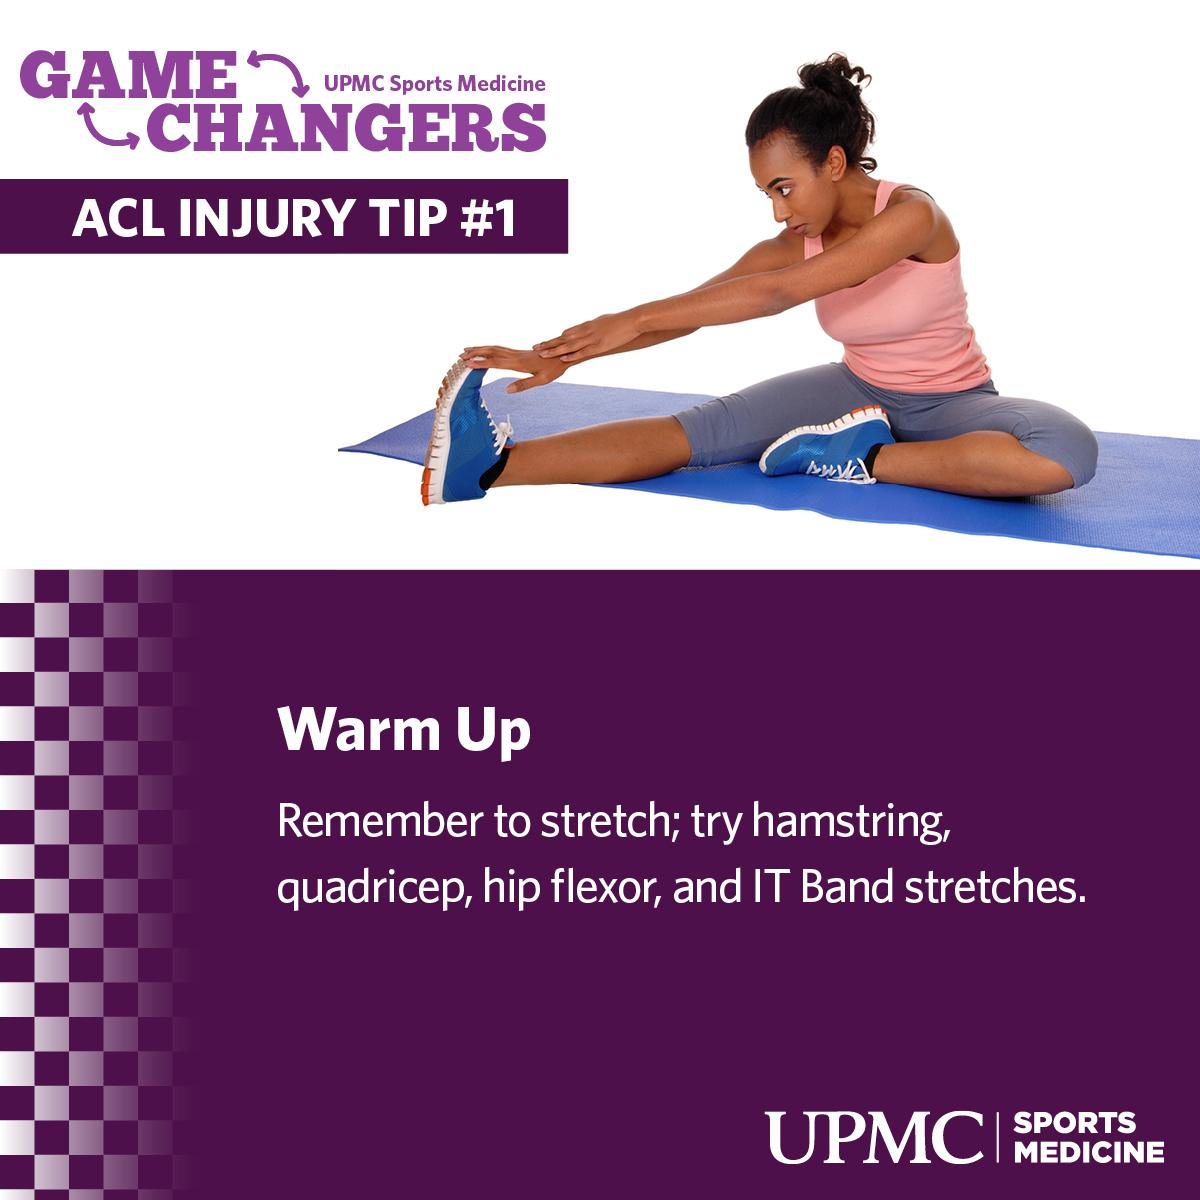 UPMC_GameChangers_ACL_FB1_FINAL